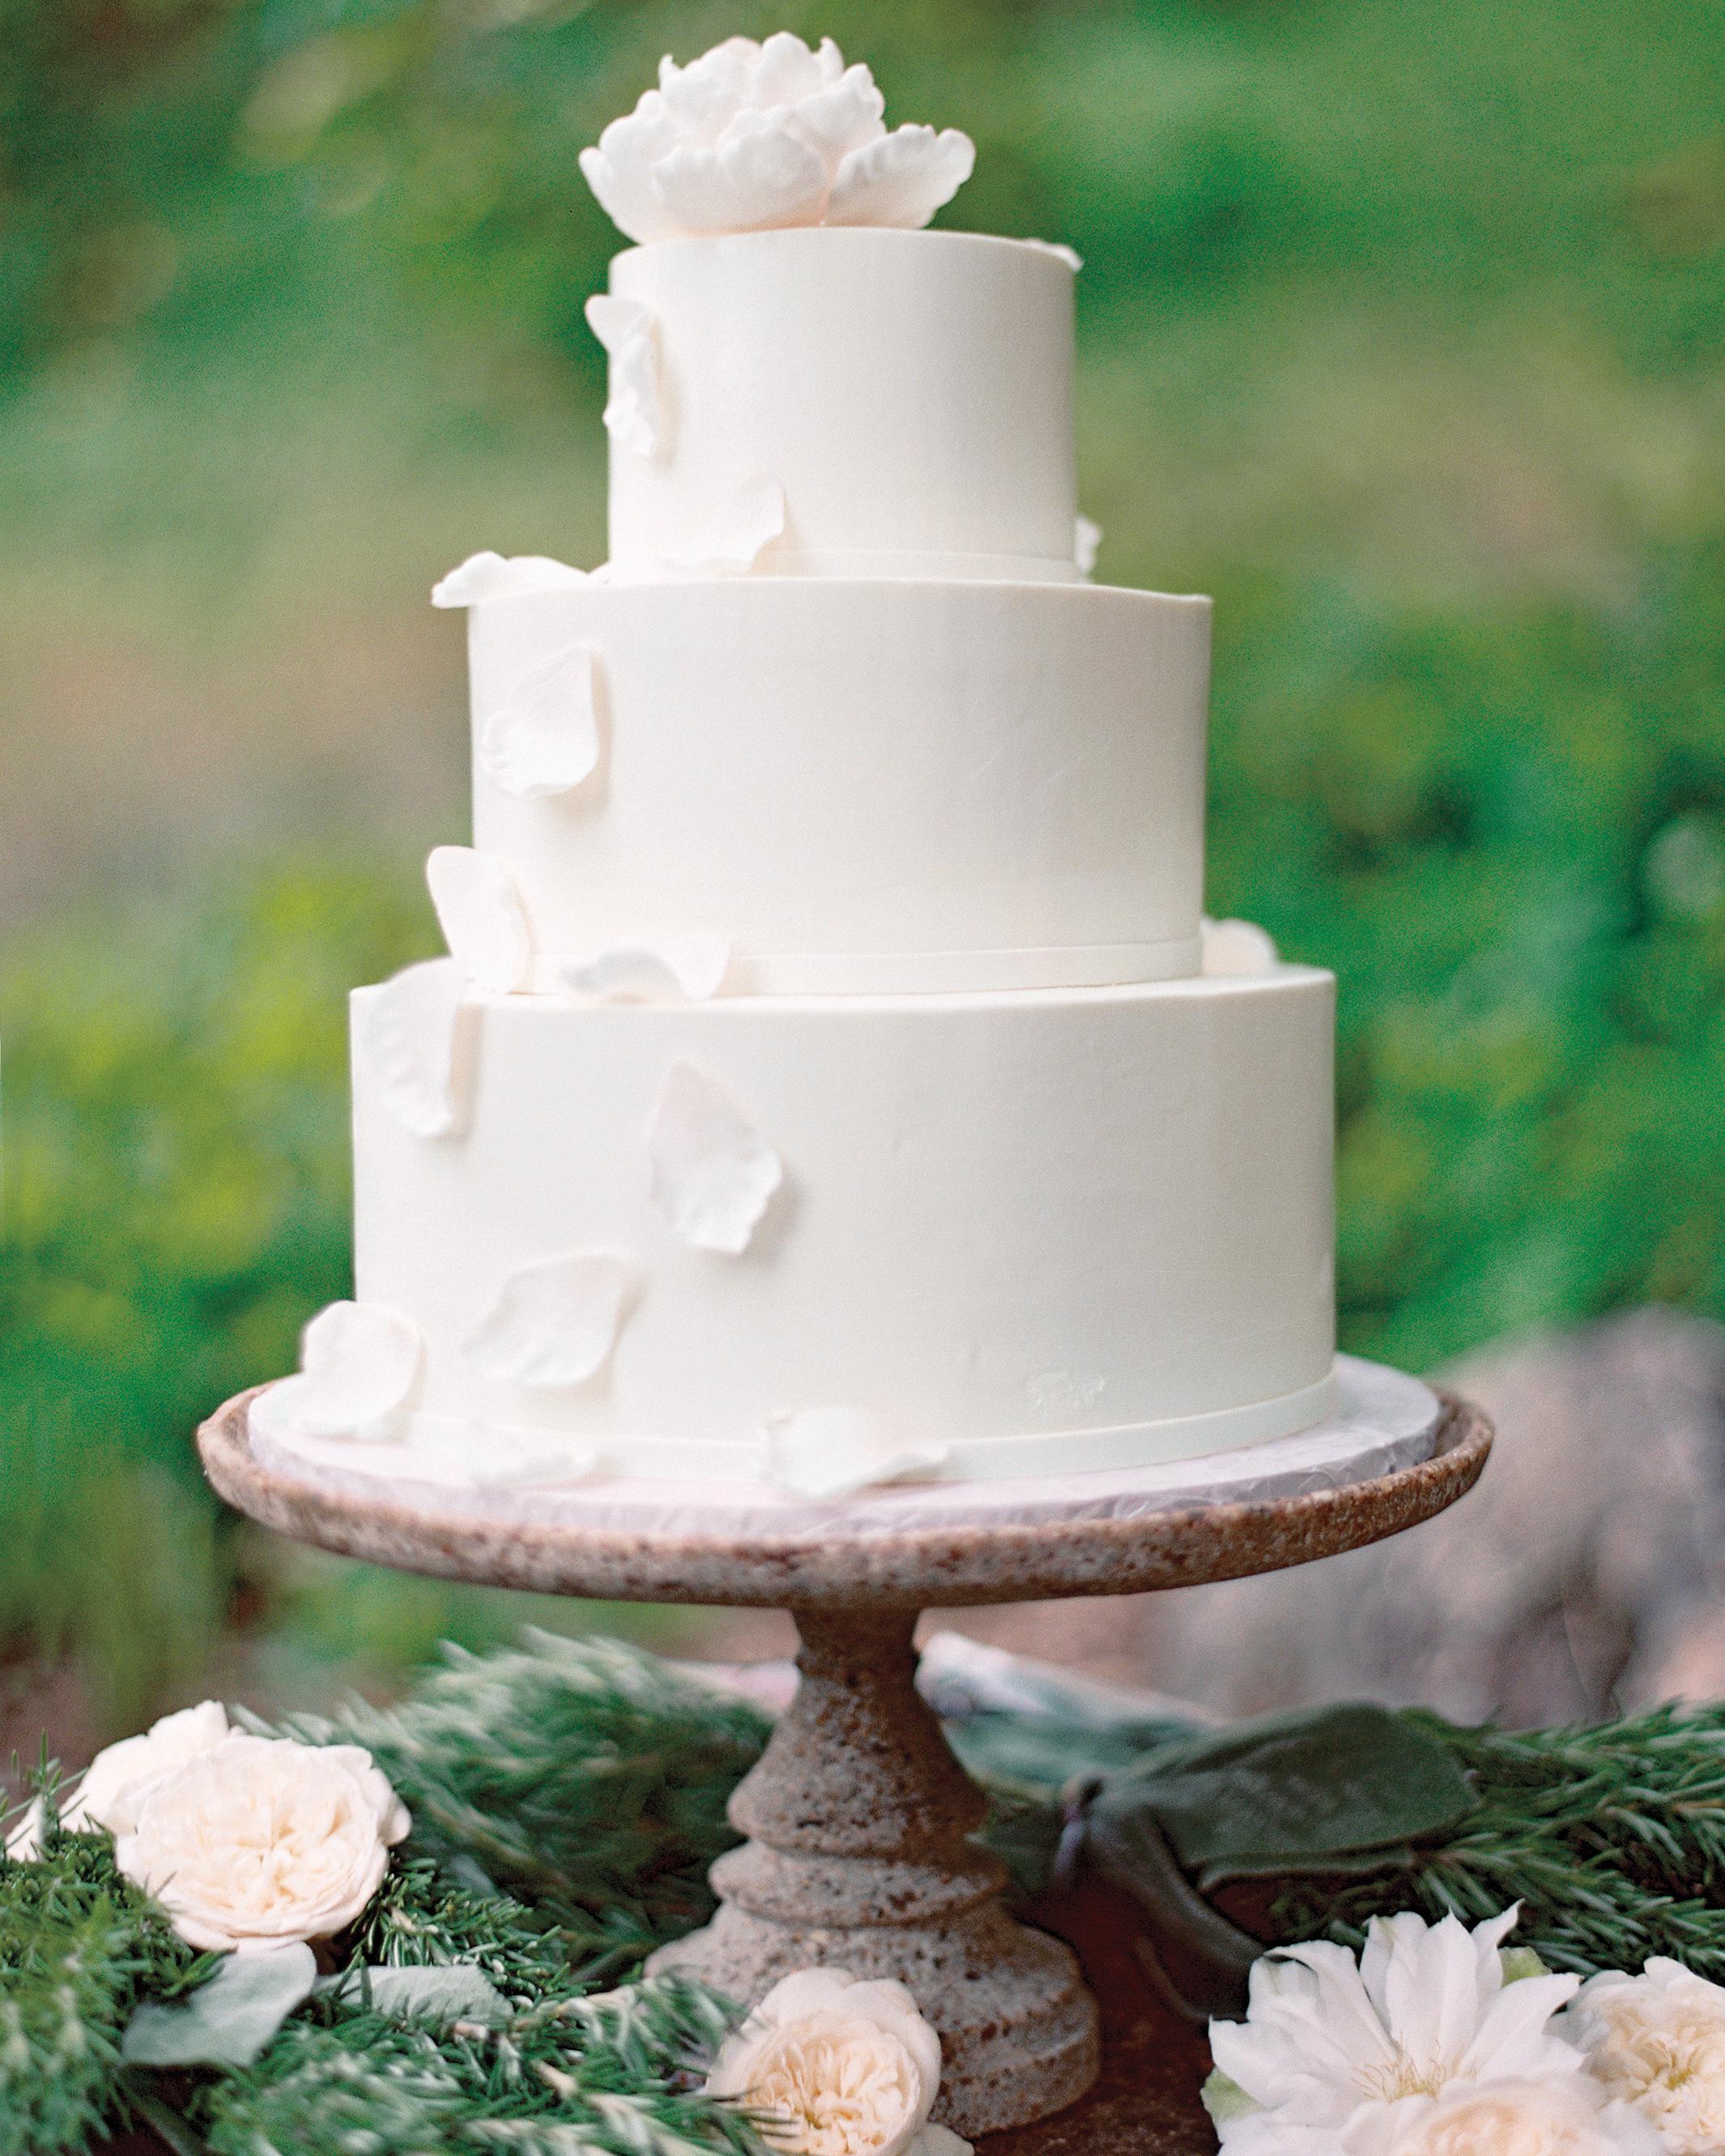 marilyn-harold-cake-008825-015-mwds109987.jpg